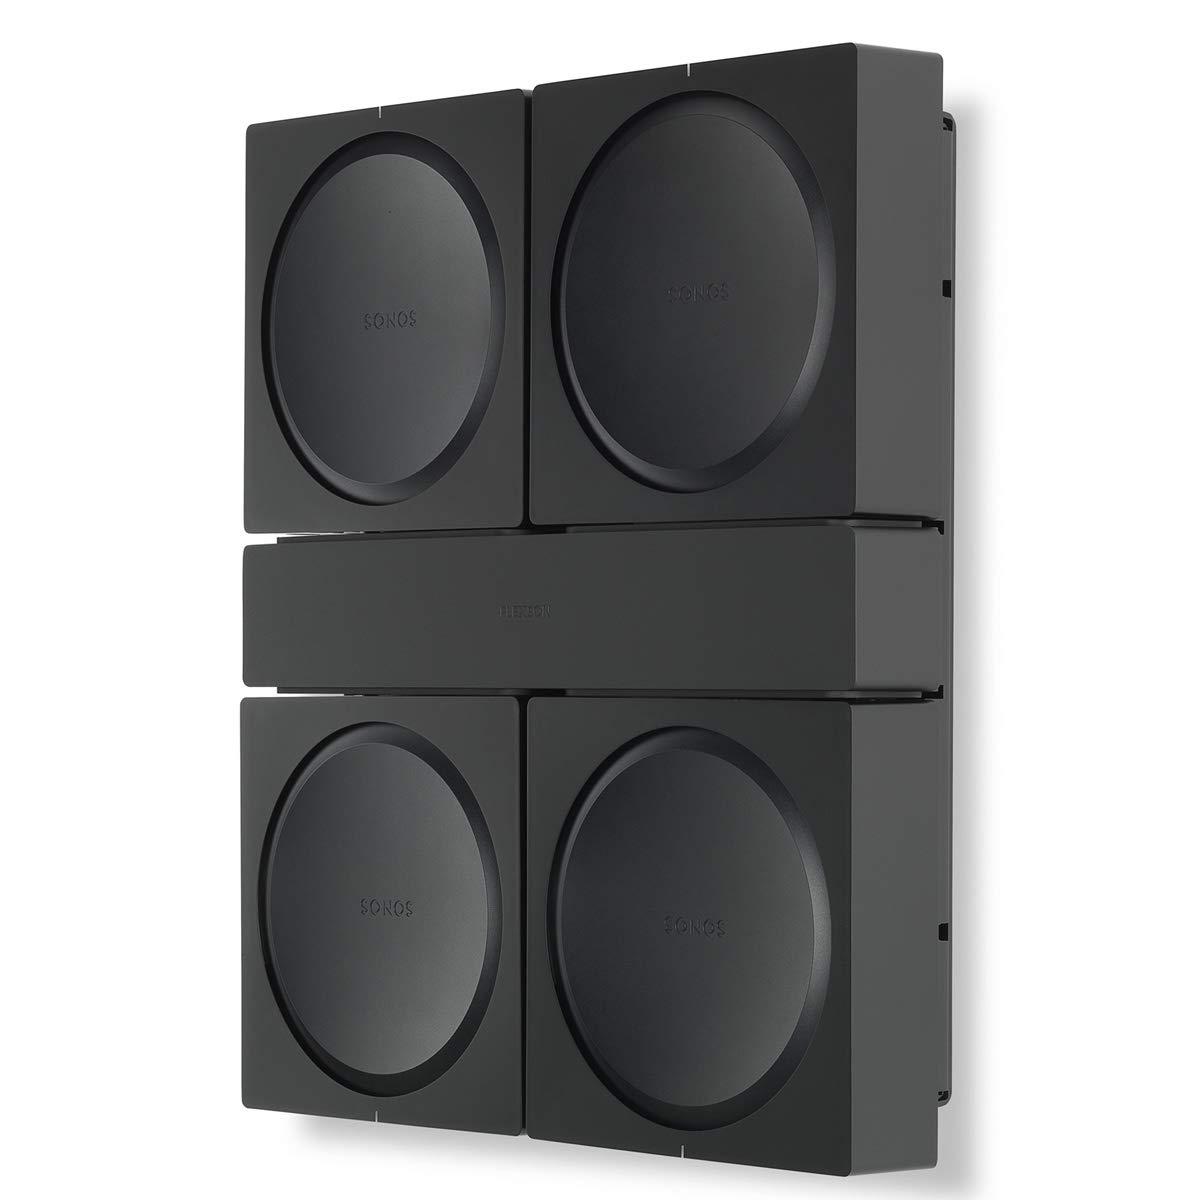 Flexson Wall Mount for 4 Sonos AMPs (Black)